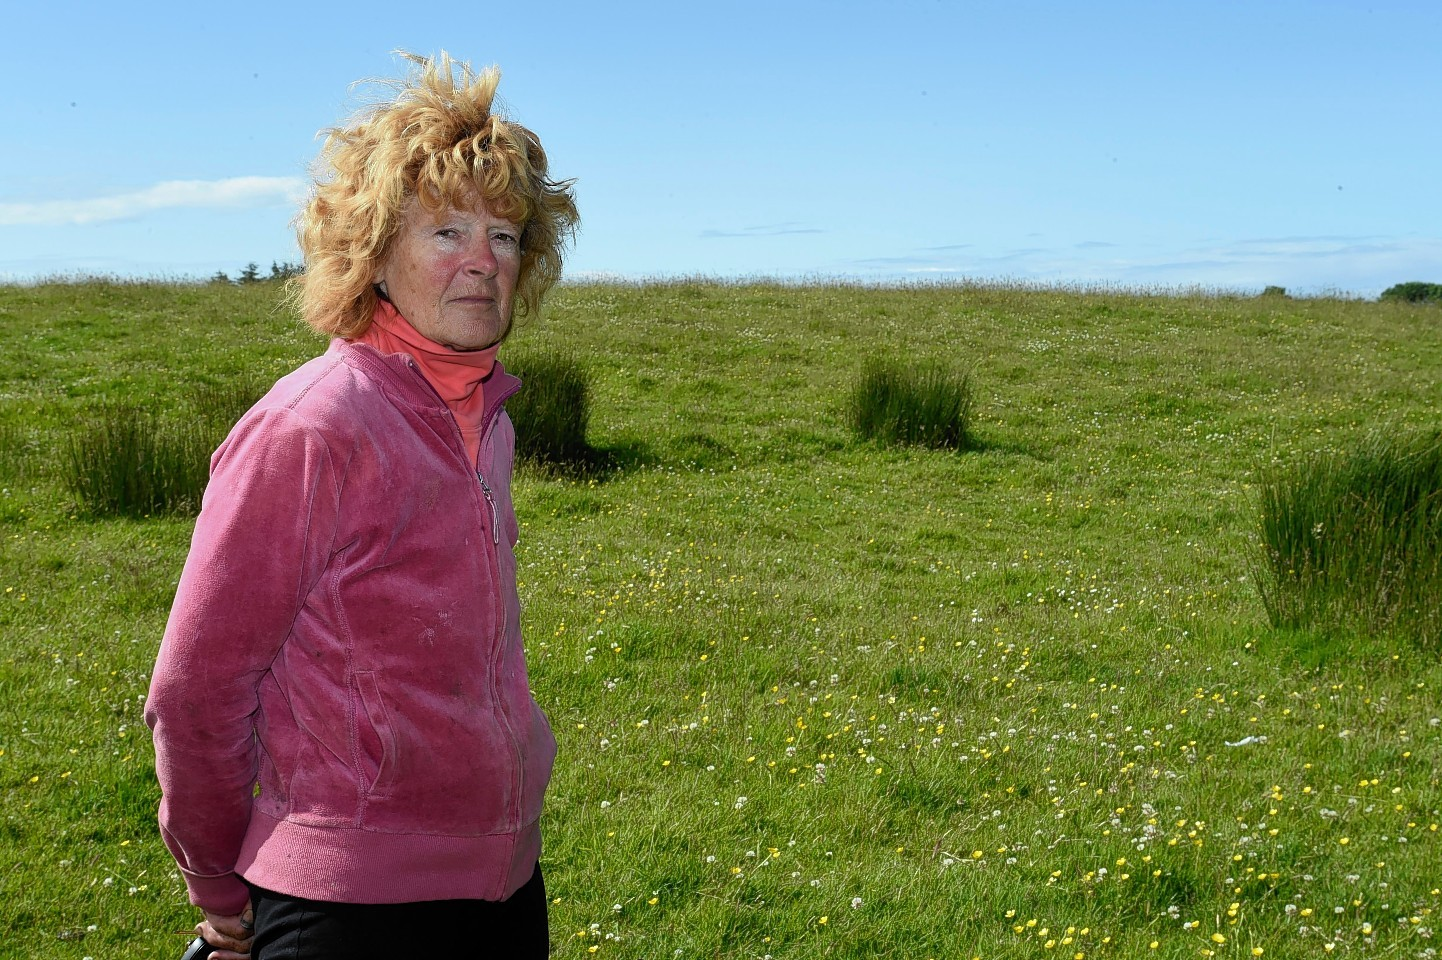 Sharon Bruckshaw chained herself to her tractor